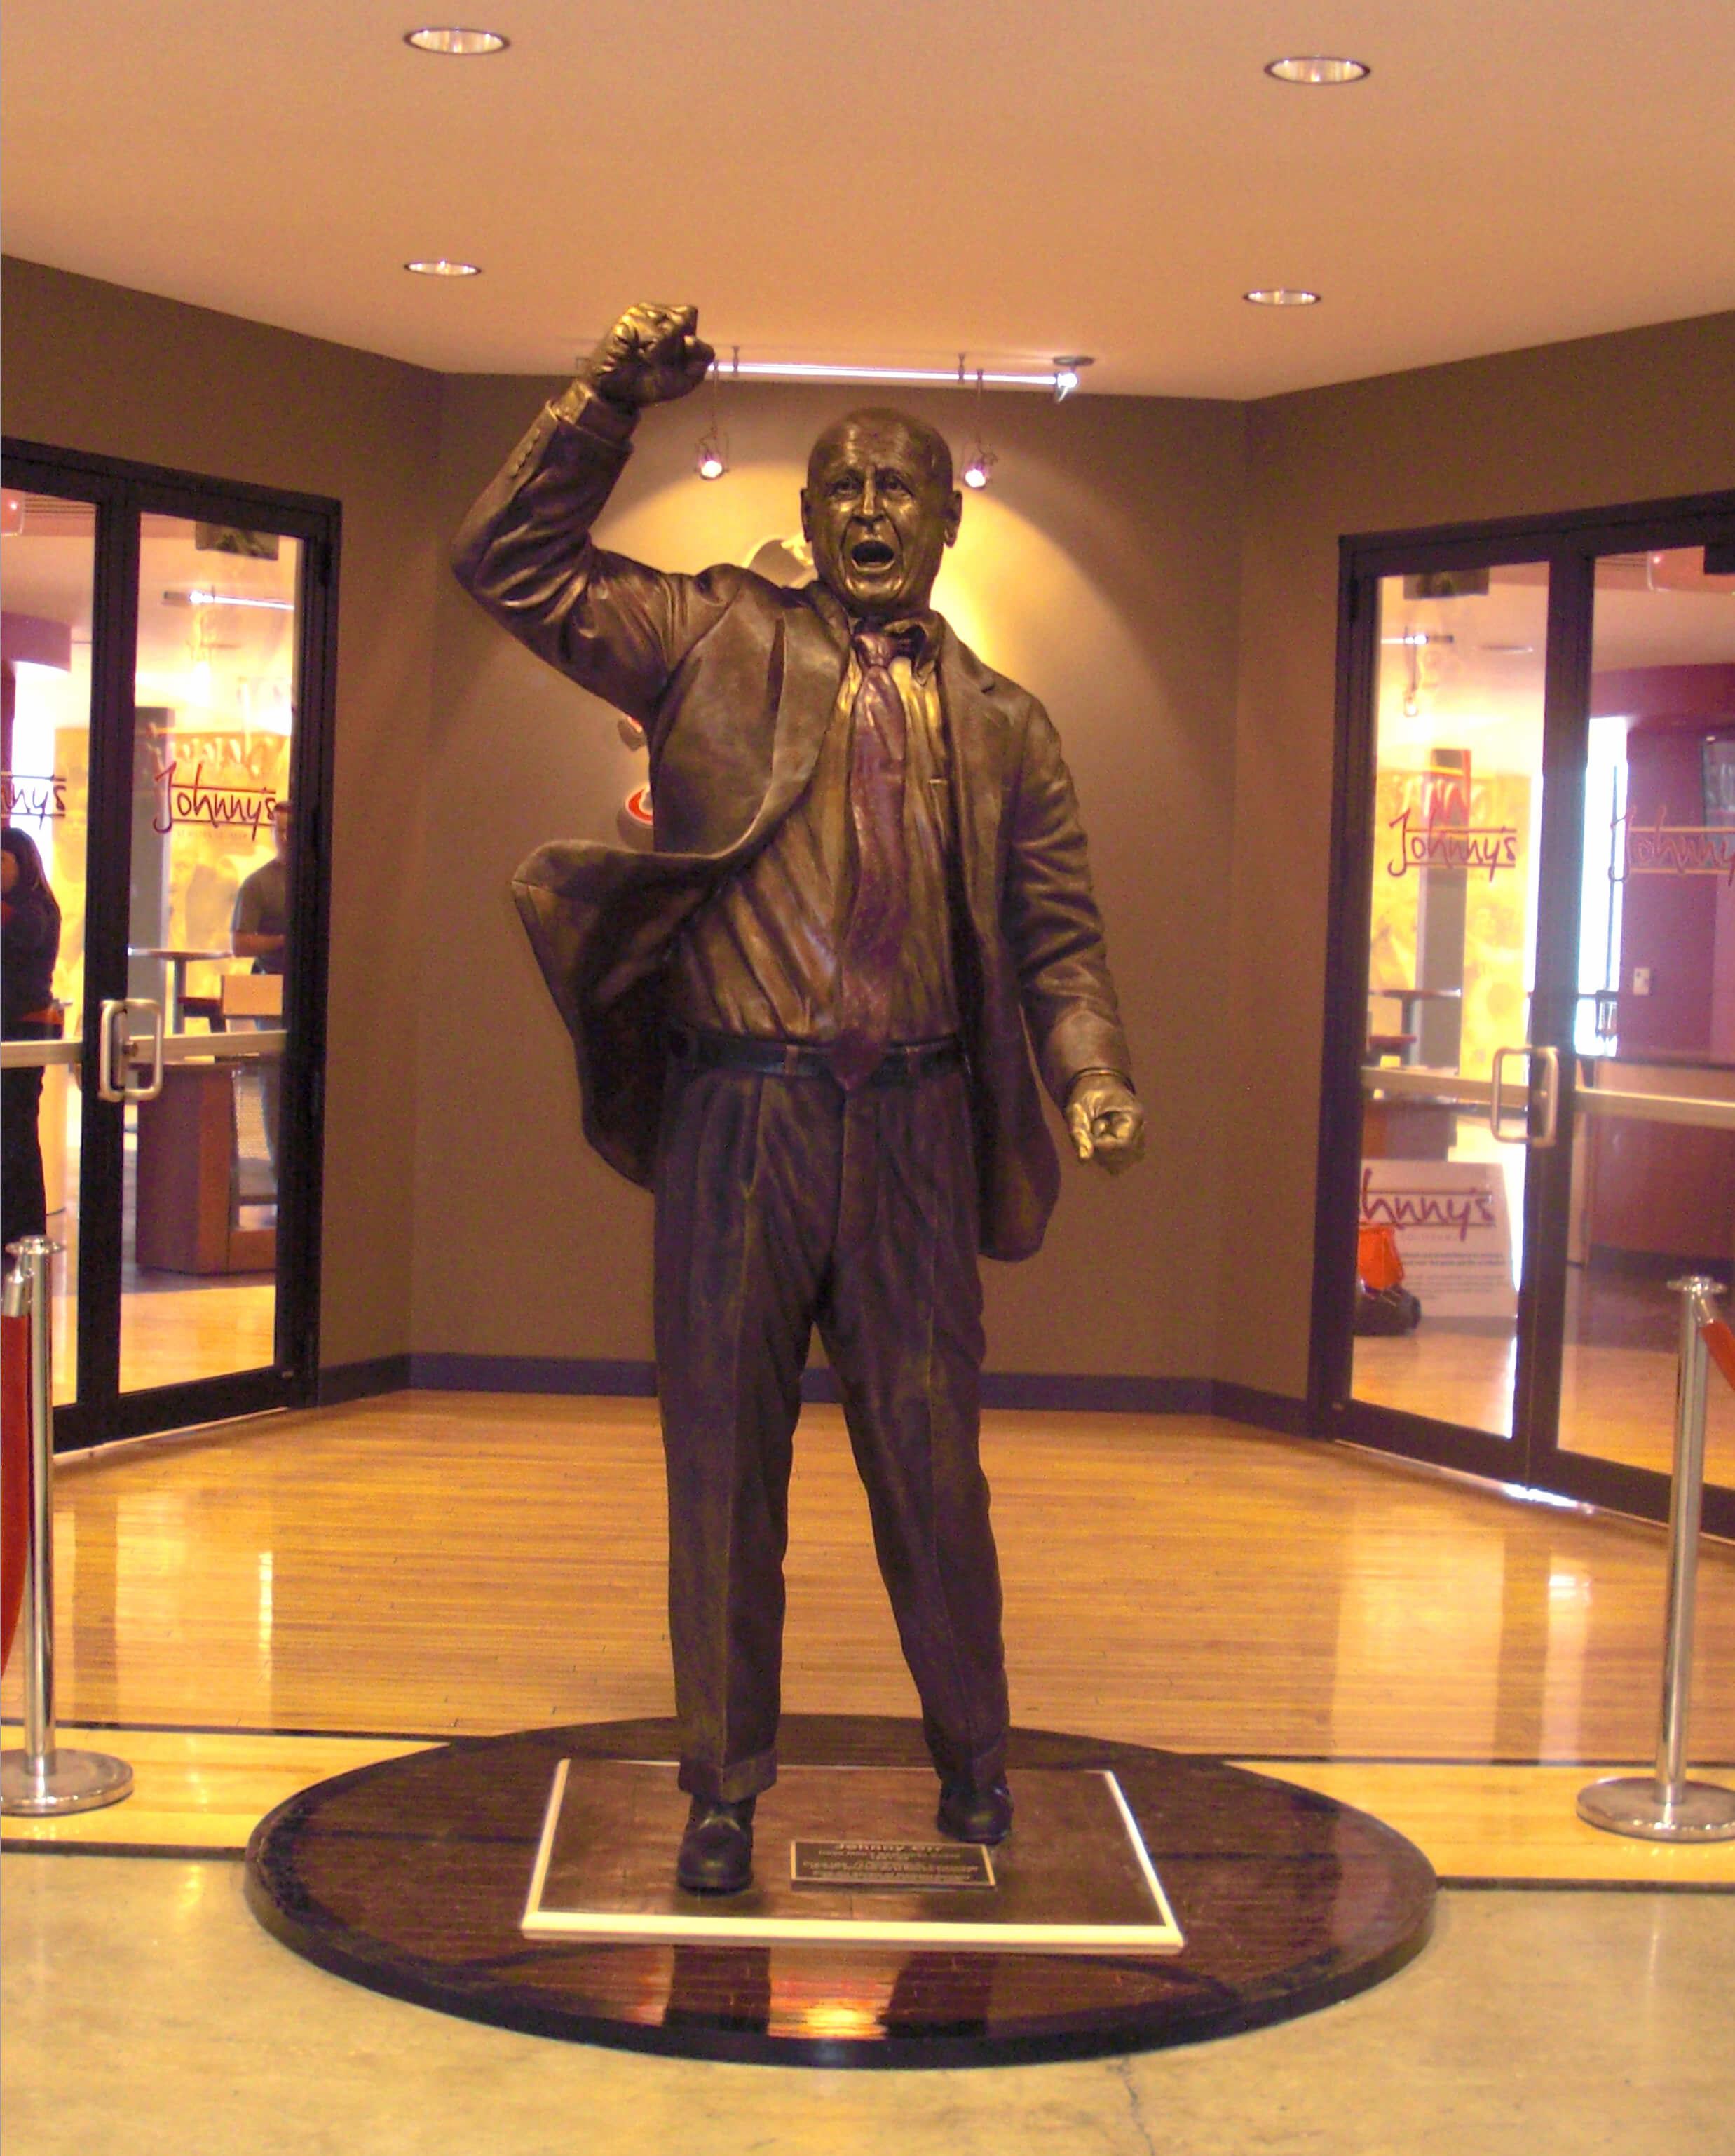 Johnny Orr statue, ISU, Ames, Iowa State